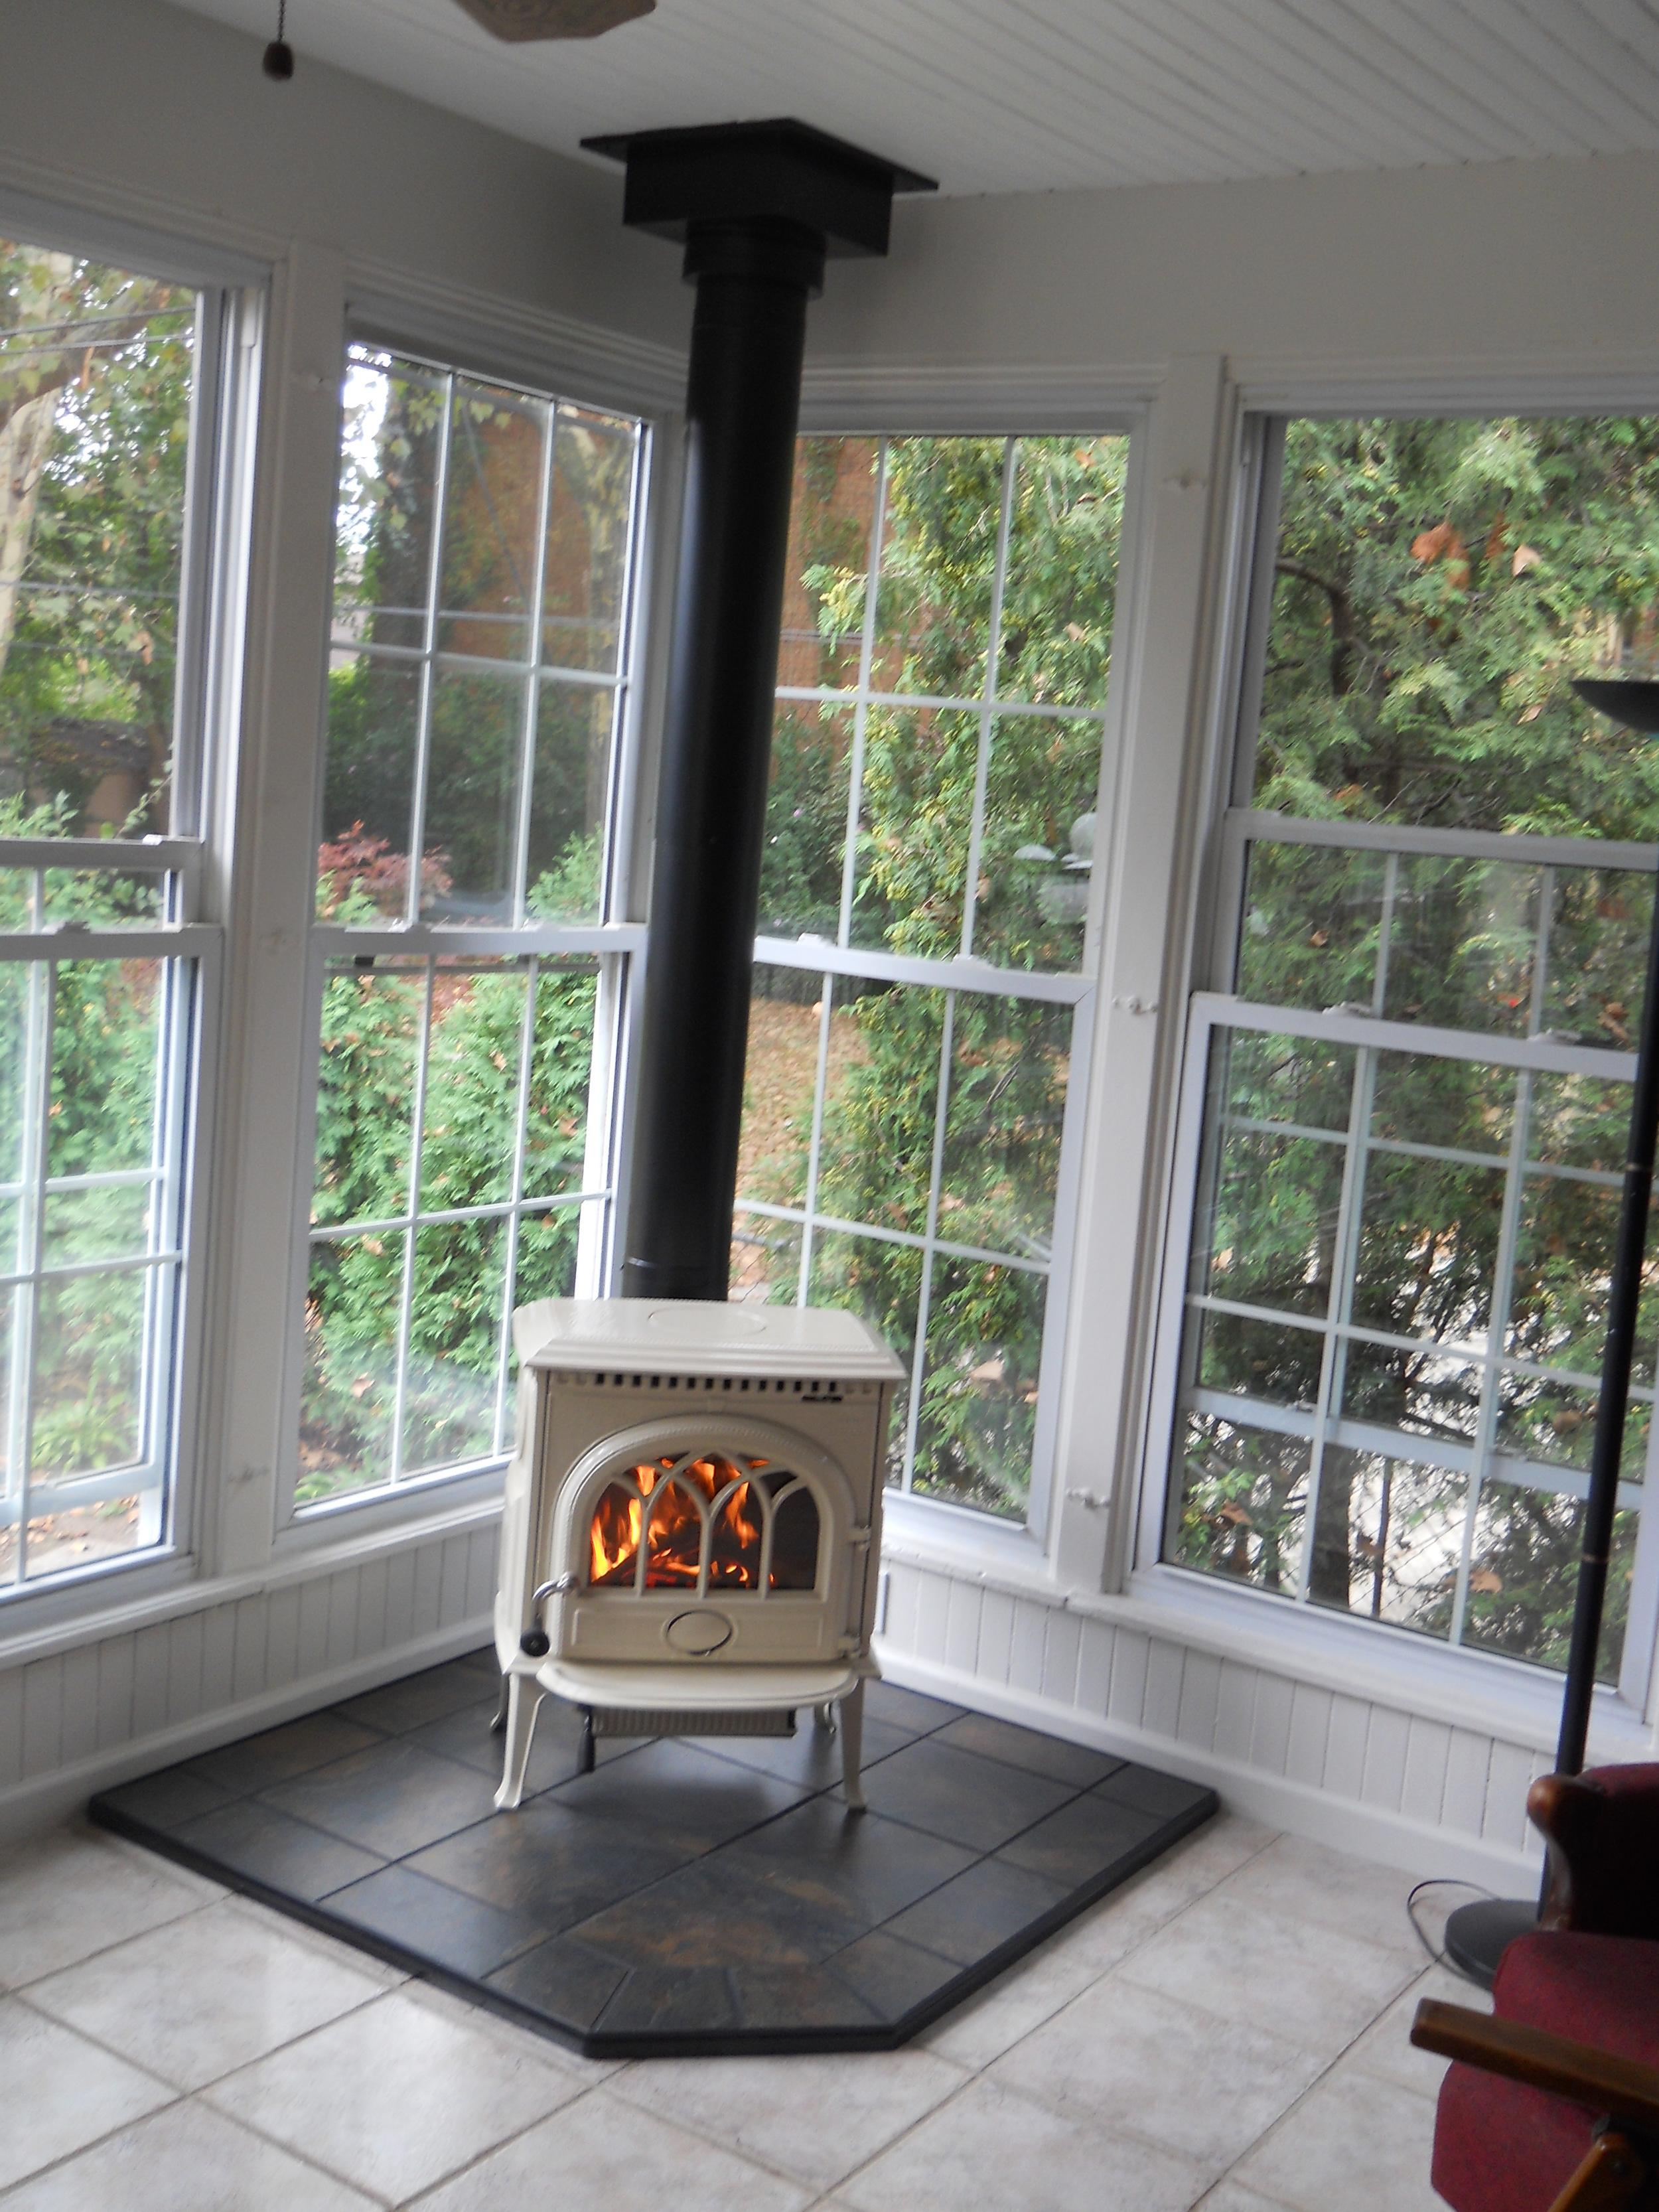 Northfield Fireplace  GrillsJob Pictures